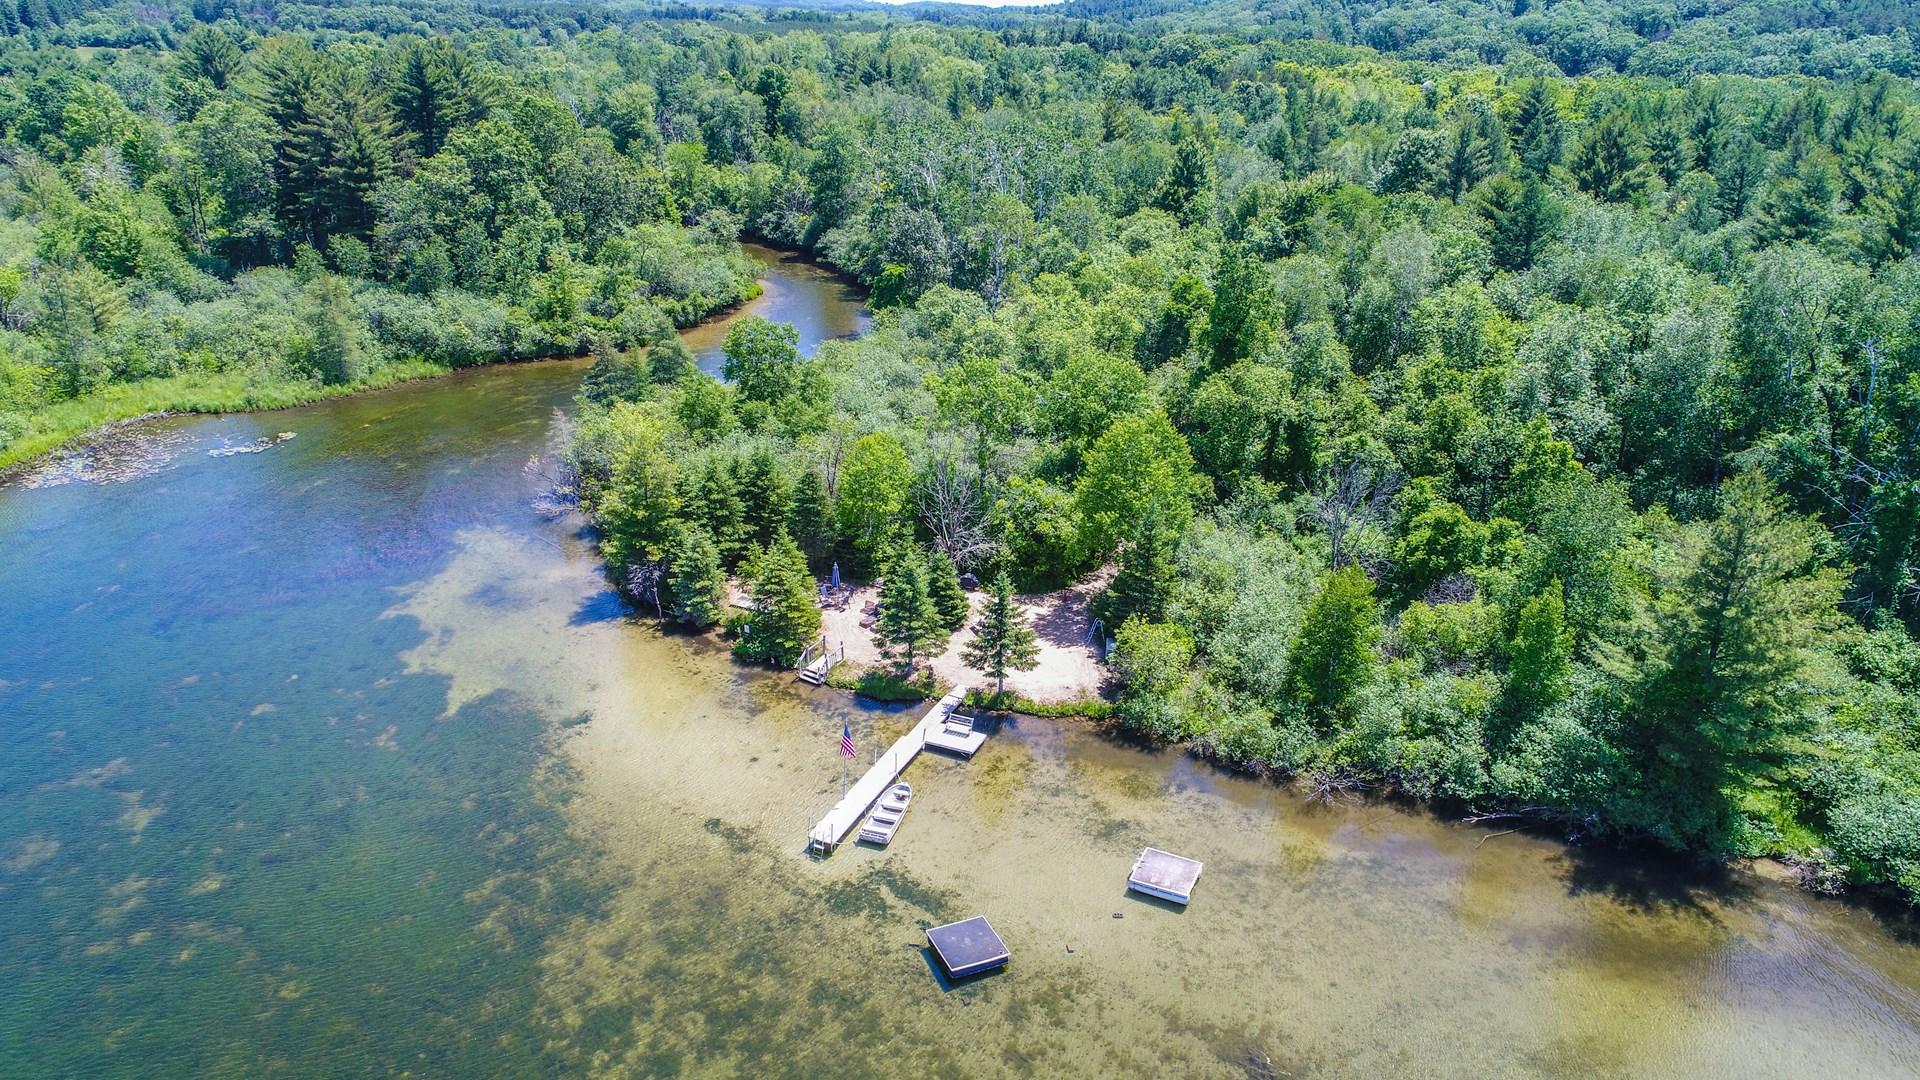 Acerage, Farmhouse Chain O' Lakes & Crystal River Waupaca WI